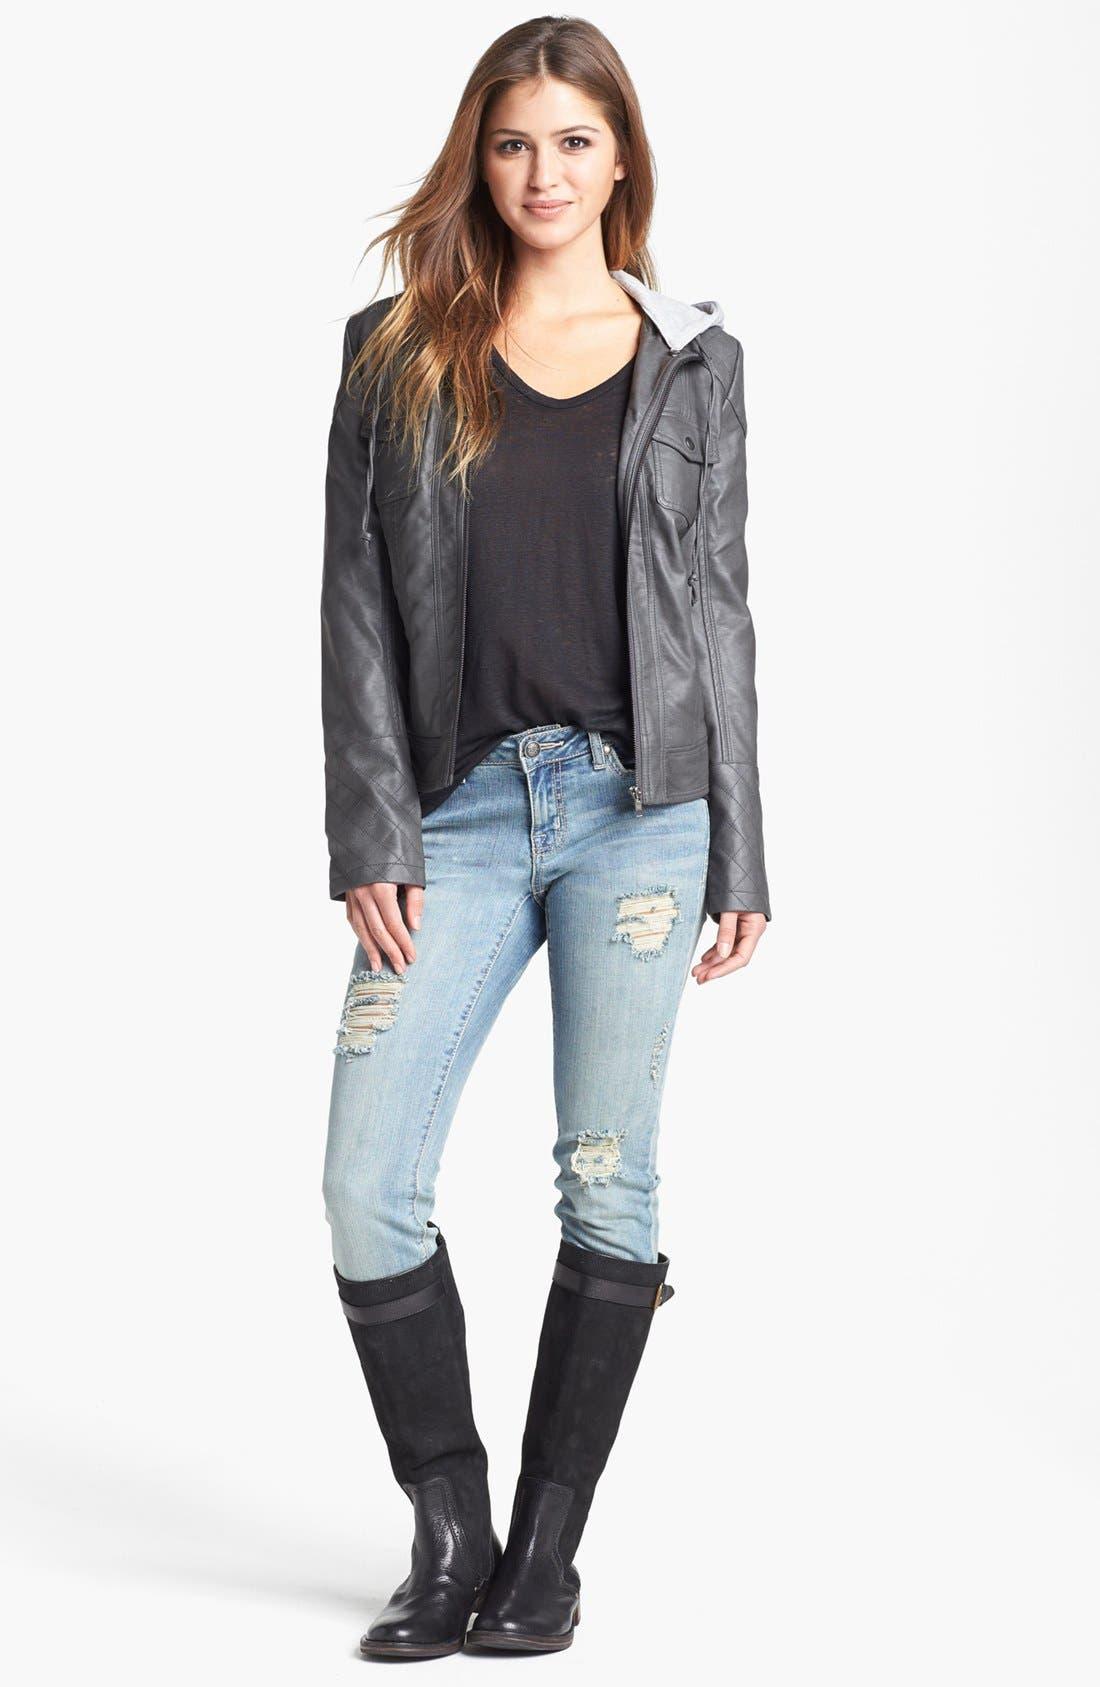 Alternate Image 1 Selected - Jessica Simpson 'Heathcliff' Hooded Faux Leather Jacket